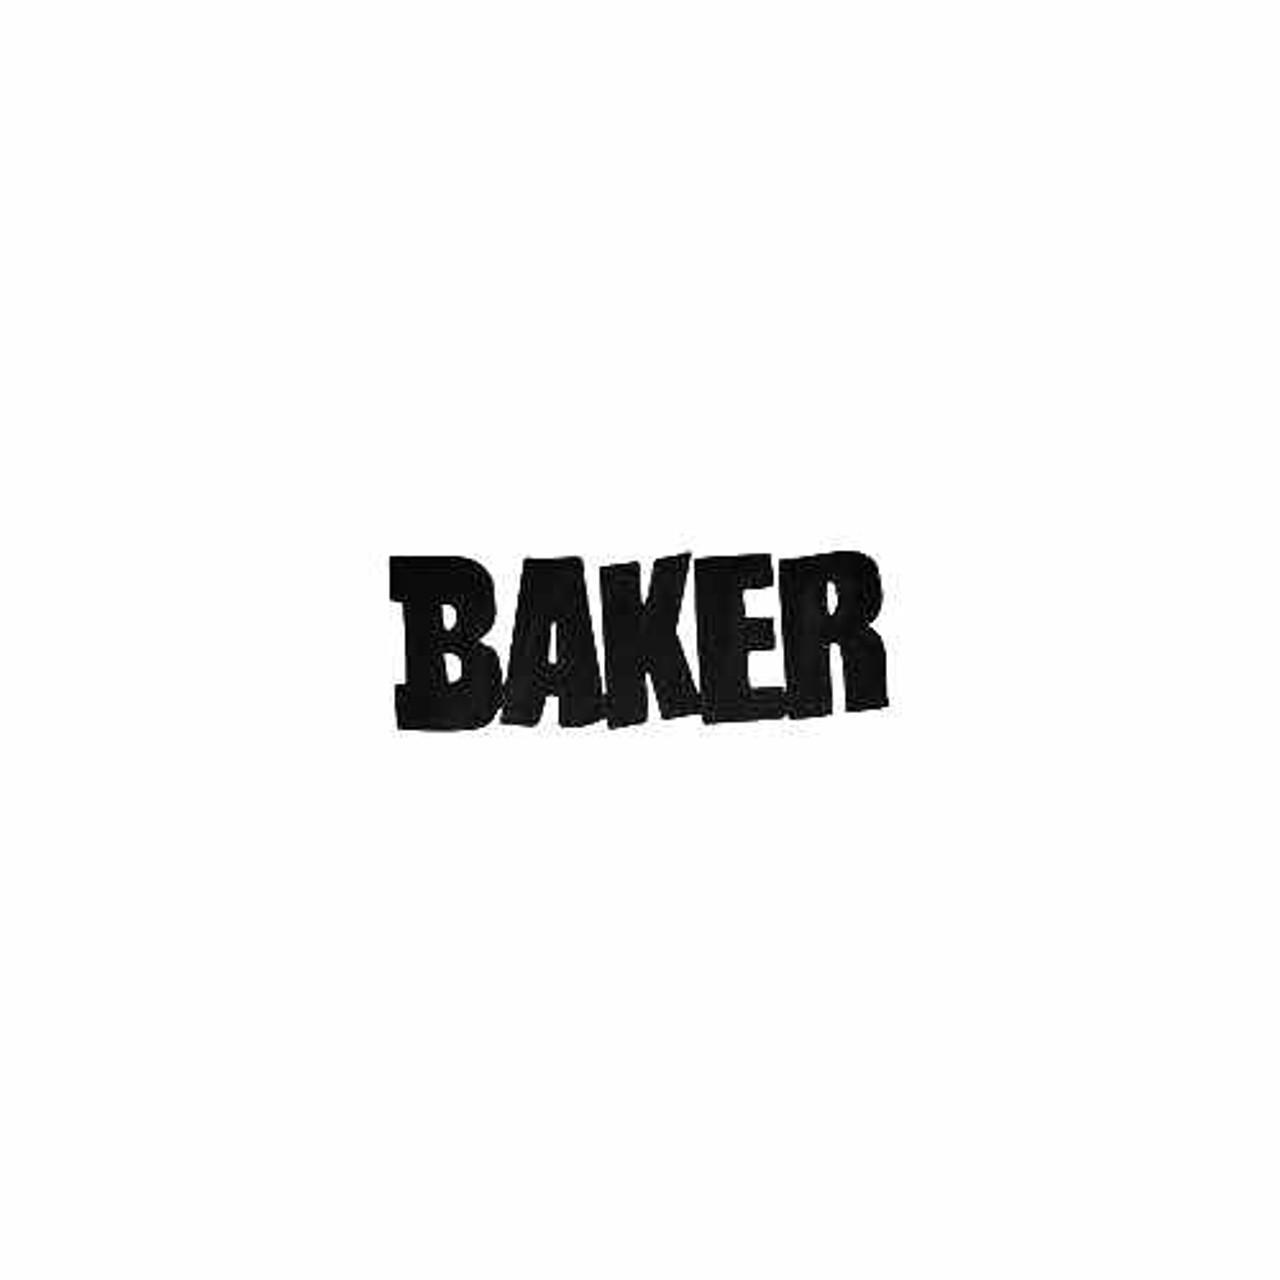 Baker Skateboard Shirt Oracle Black